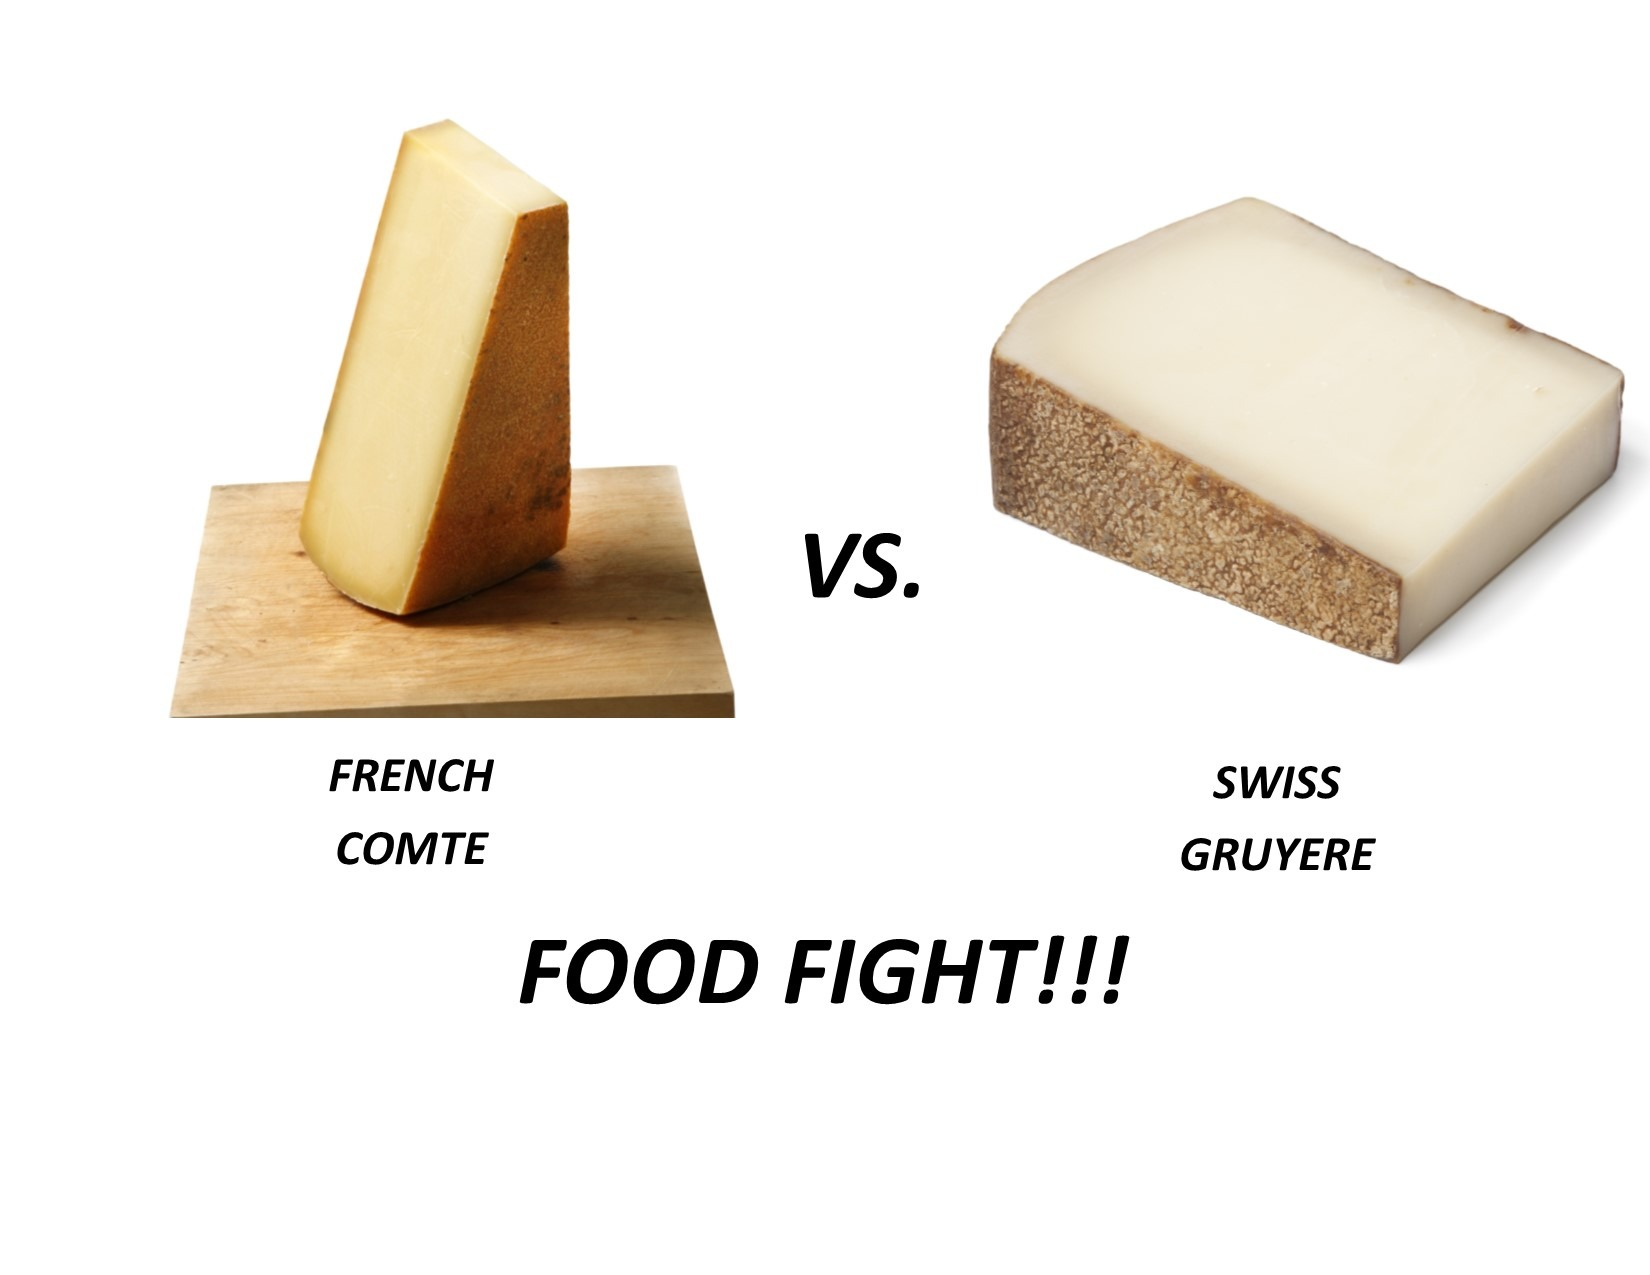 Comte vs Gruyere